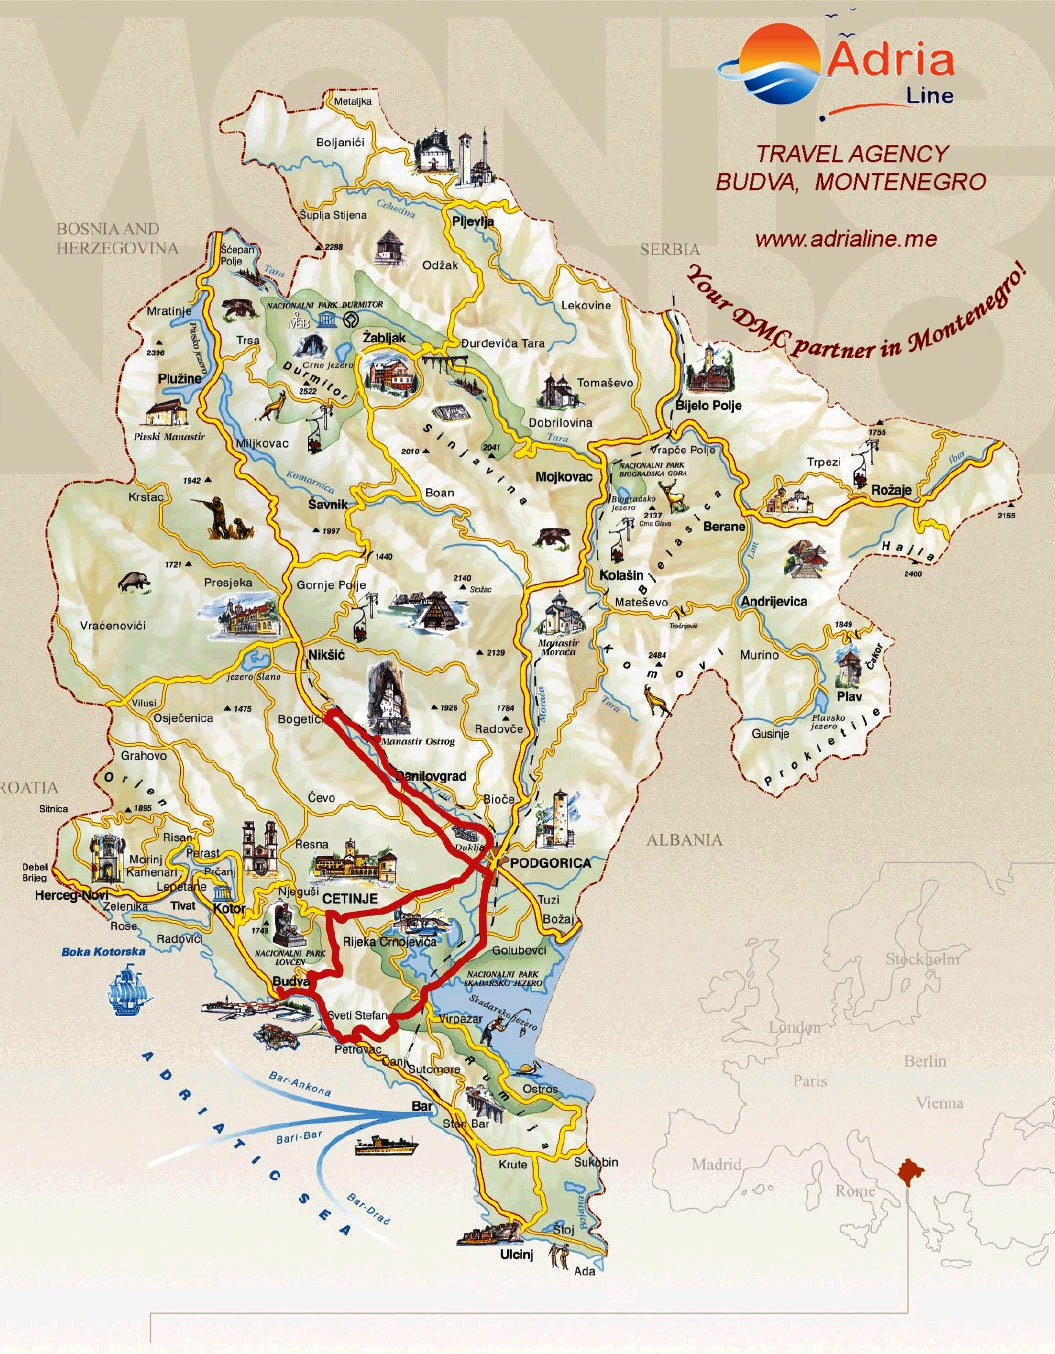 manastir ostrog crna gora mapa EXCURSION OSTROG MONASTERY   Montenegro Travel Agency Adria Line manastir ostrog crna gora mapa